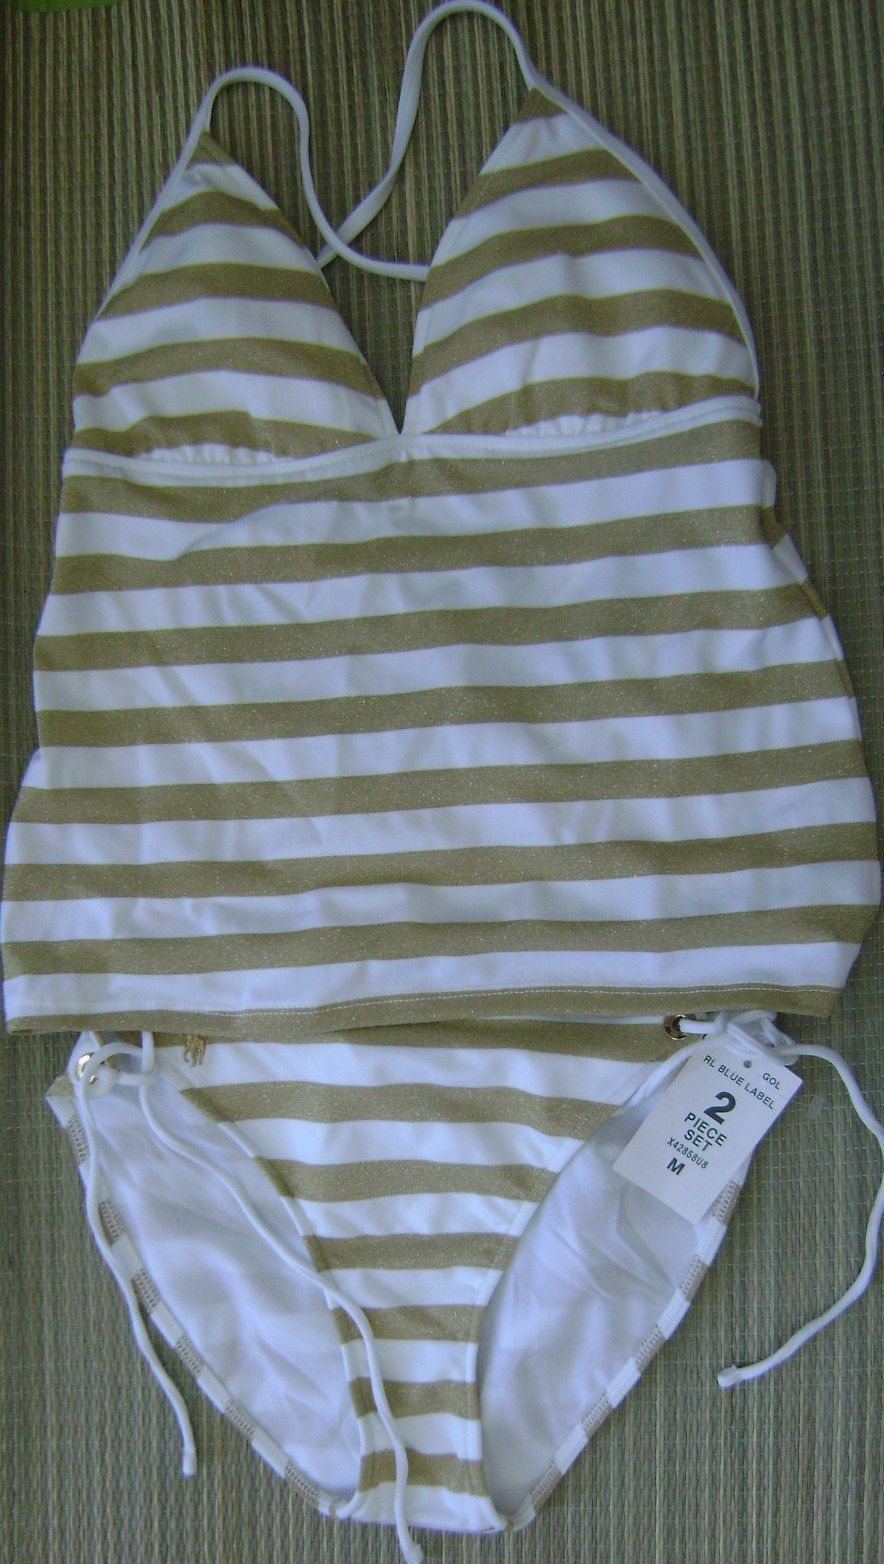 67dcd15cf4 Ralph Lauren Blue Label Women's Bikini Two and 50 similar items